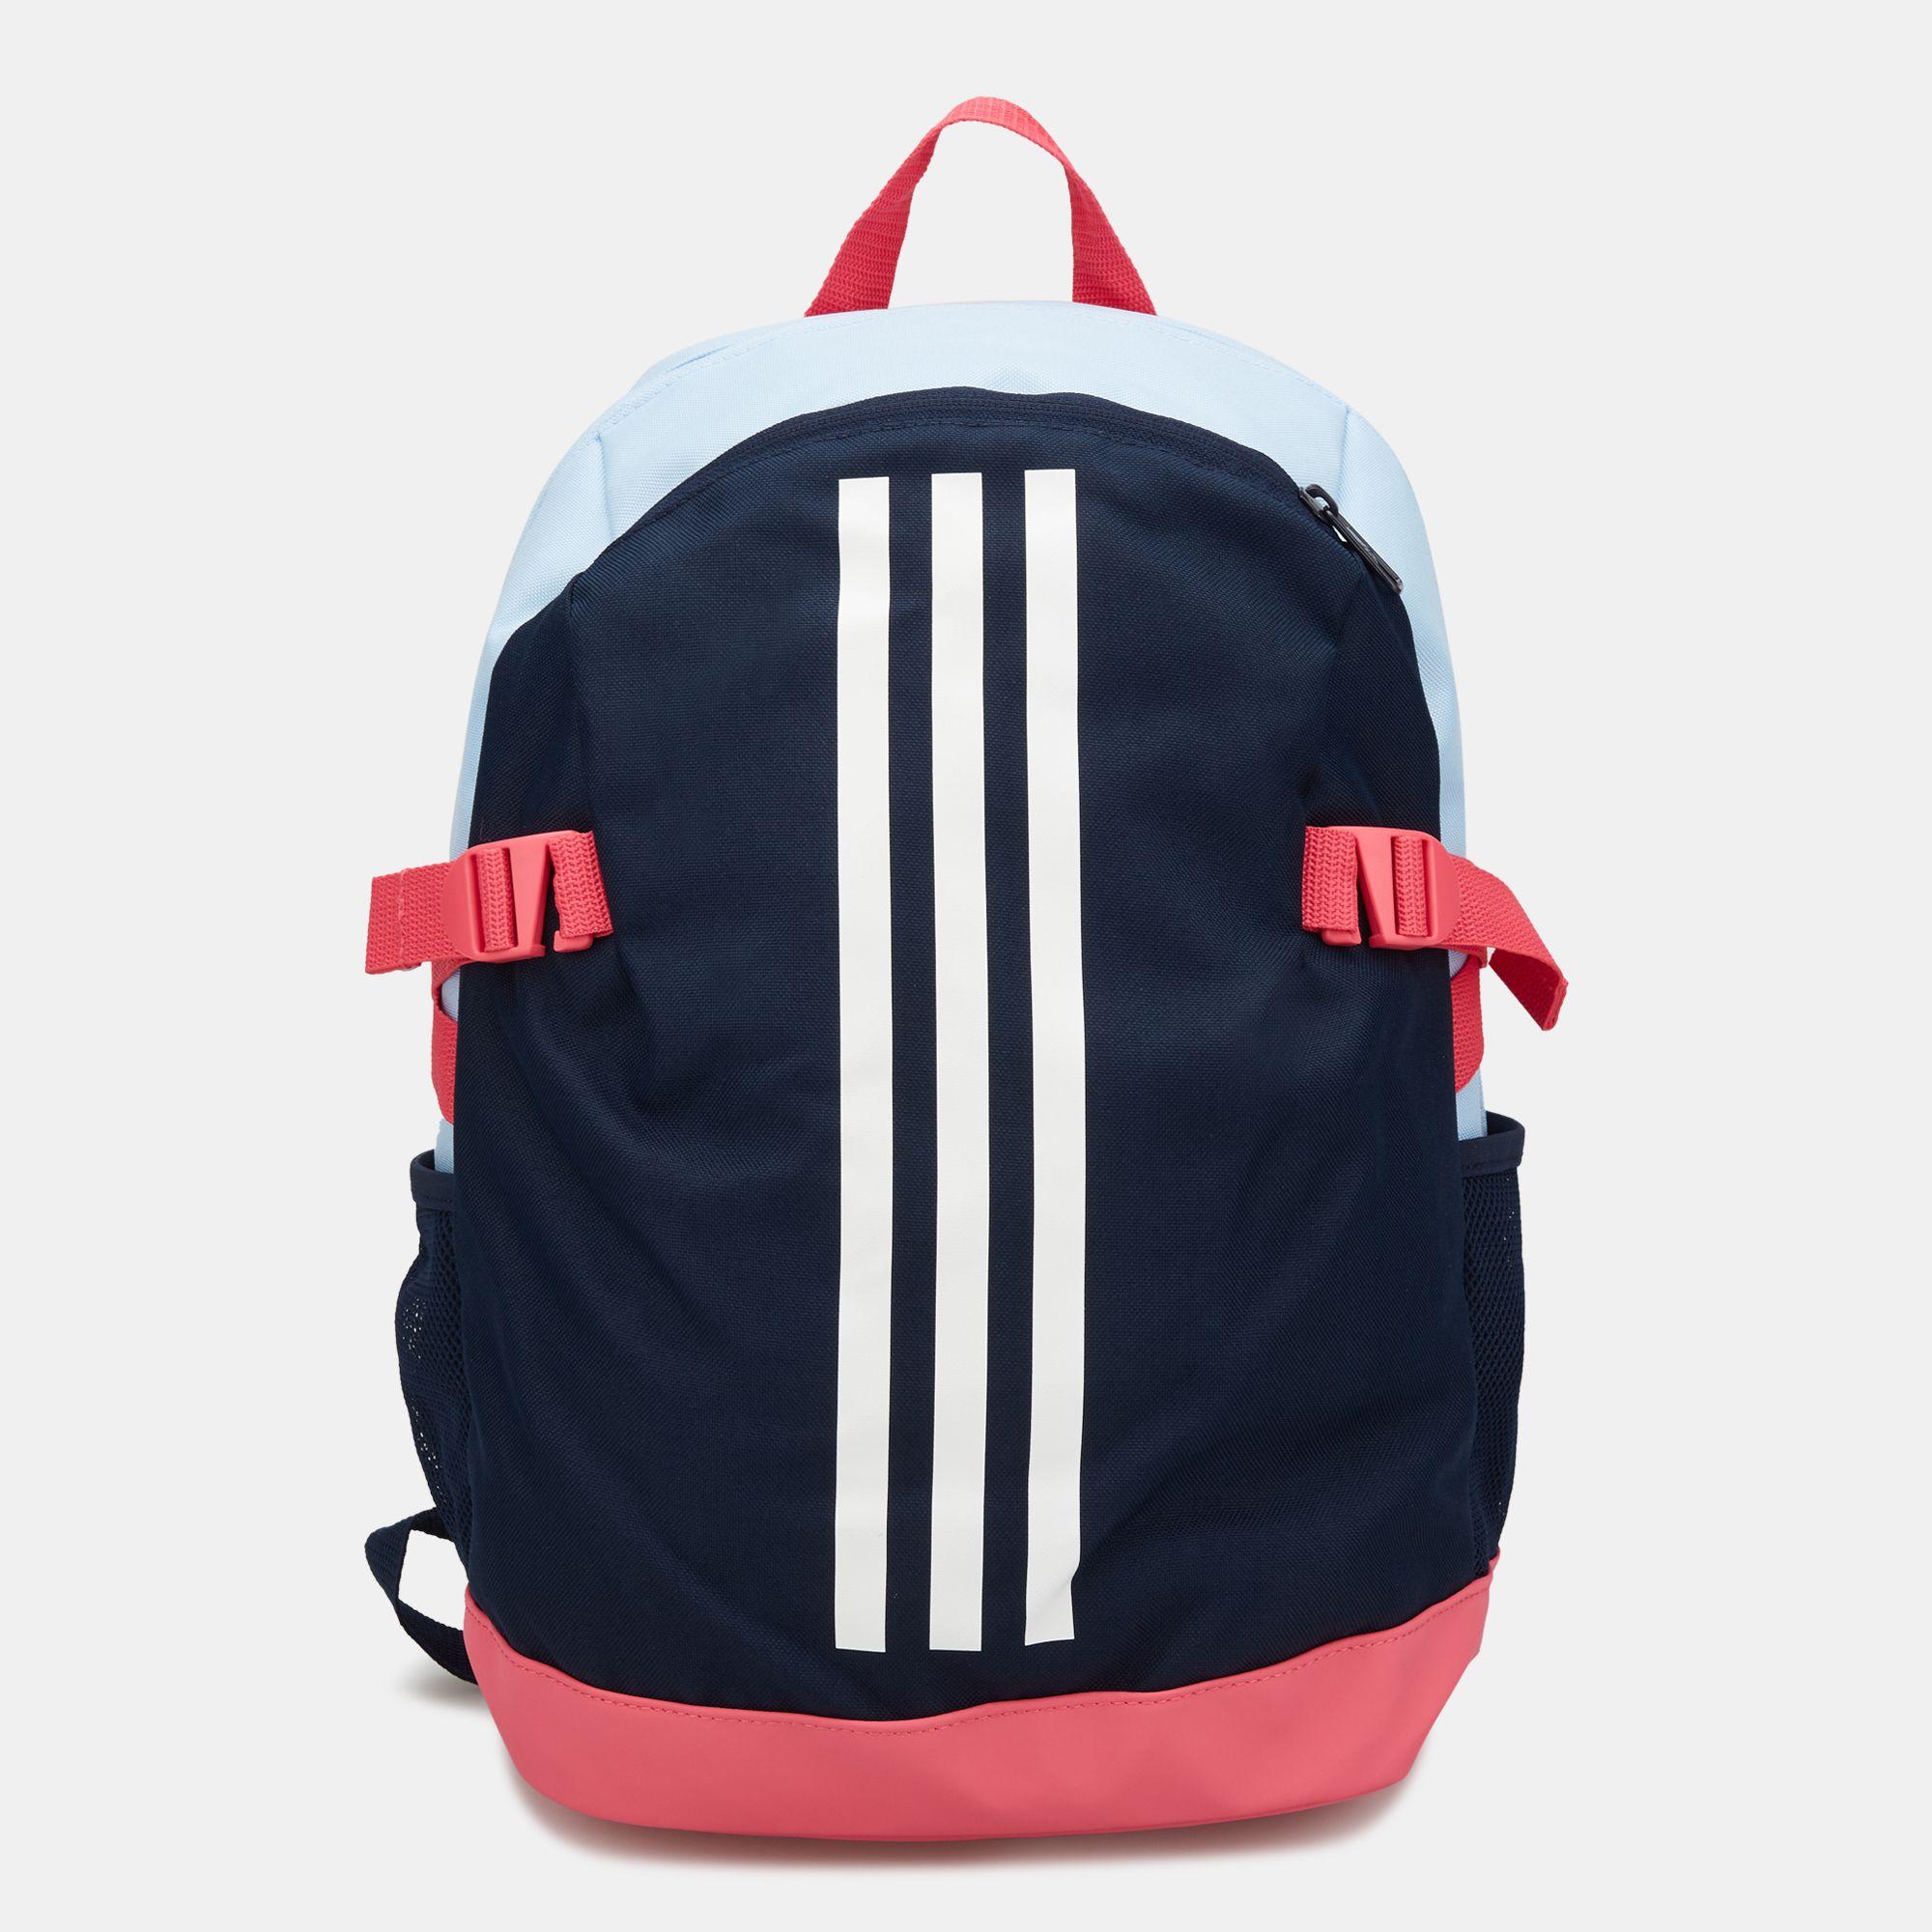 Oxidar Familiarizarse enviar  kids adidas bag Online Shopping for Women, Men, Kids Fashion &  Lifestyle|Free Delivery & Returns! -